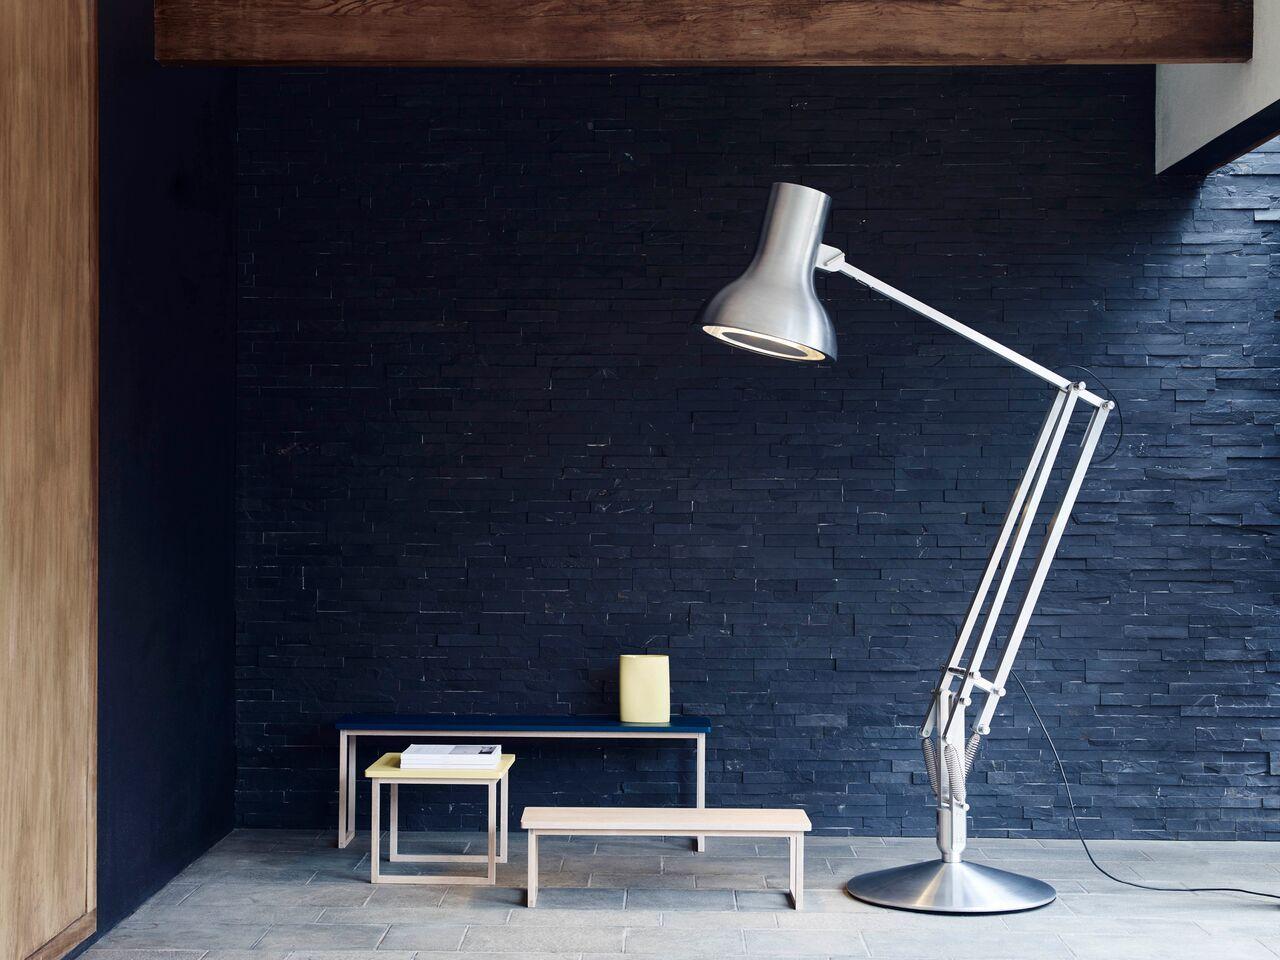 Lampe géante Anglepoise Lampe design